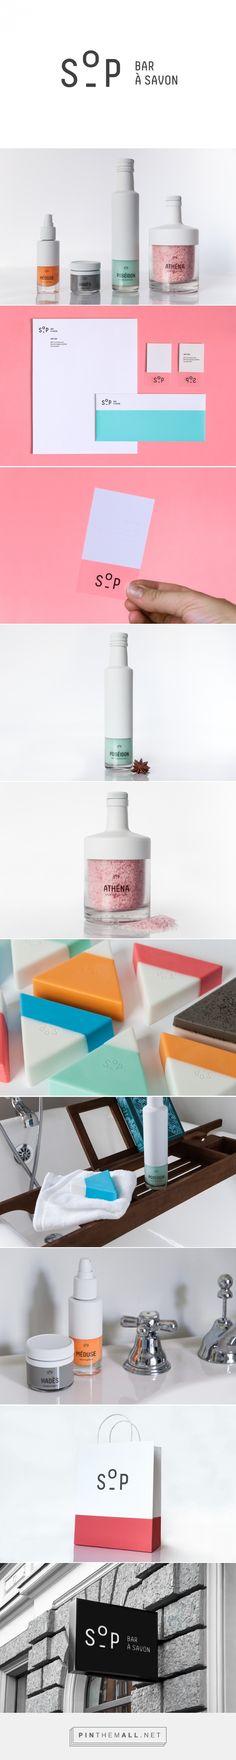 SOP Soap Bar Branding by Krystina Kouros on Behance | Fivestar Branding – Design and Branding Agency & Inspiration Gallery